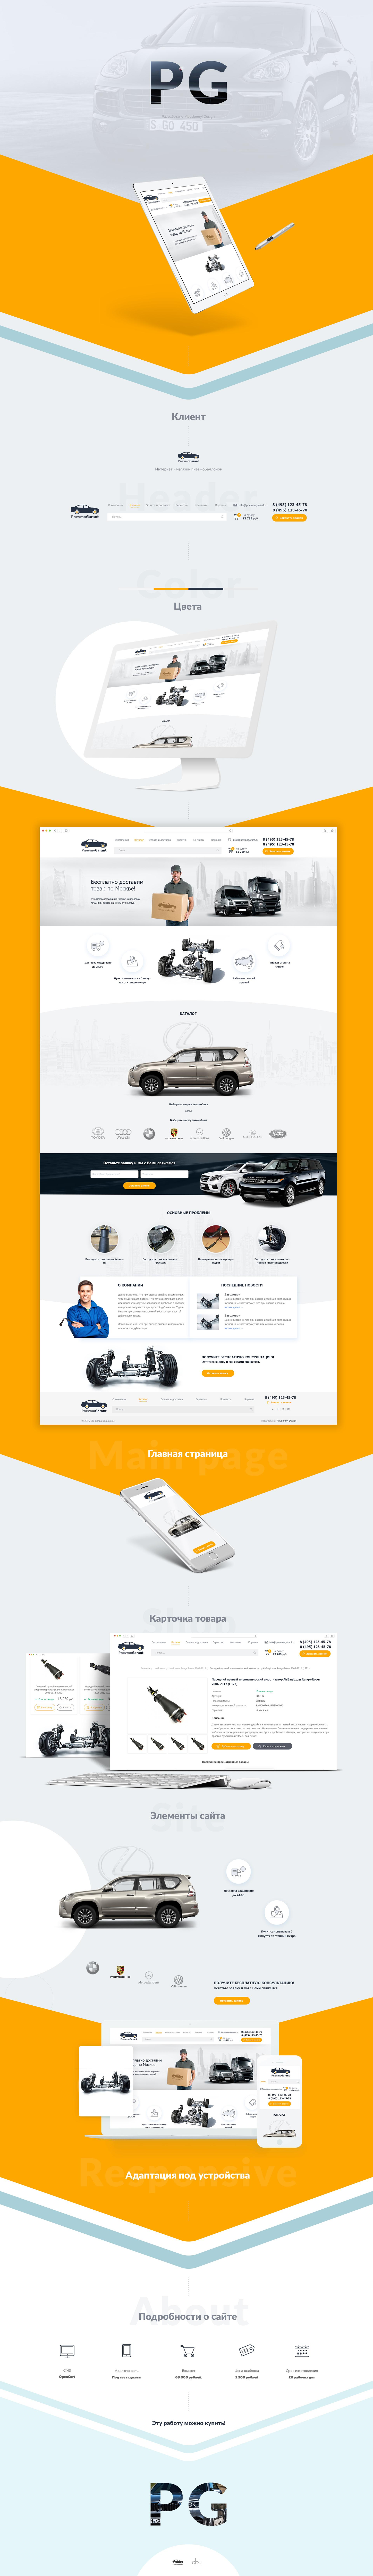 PNEVMOGARANT - Интернет магазин пневмобаллонов